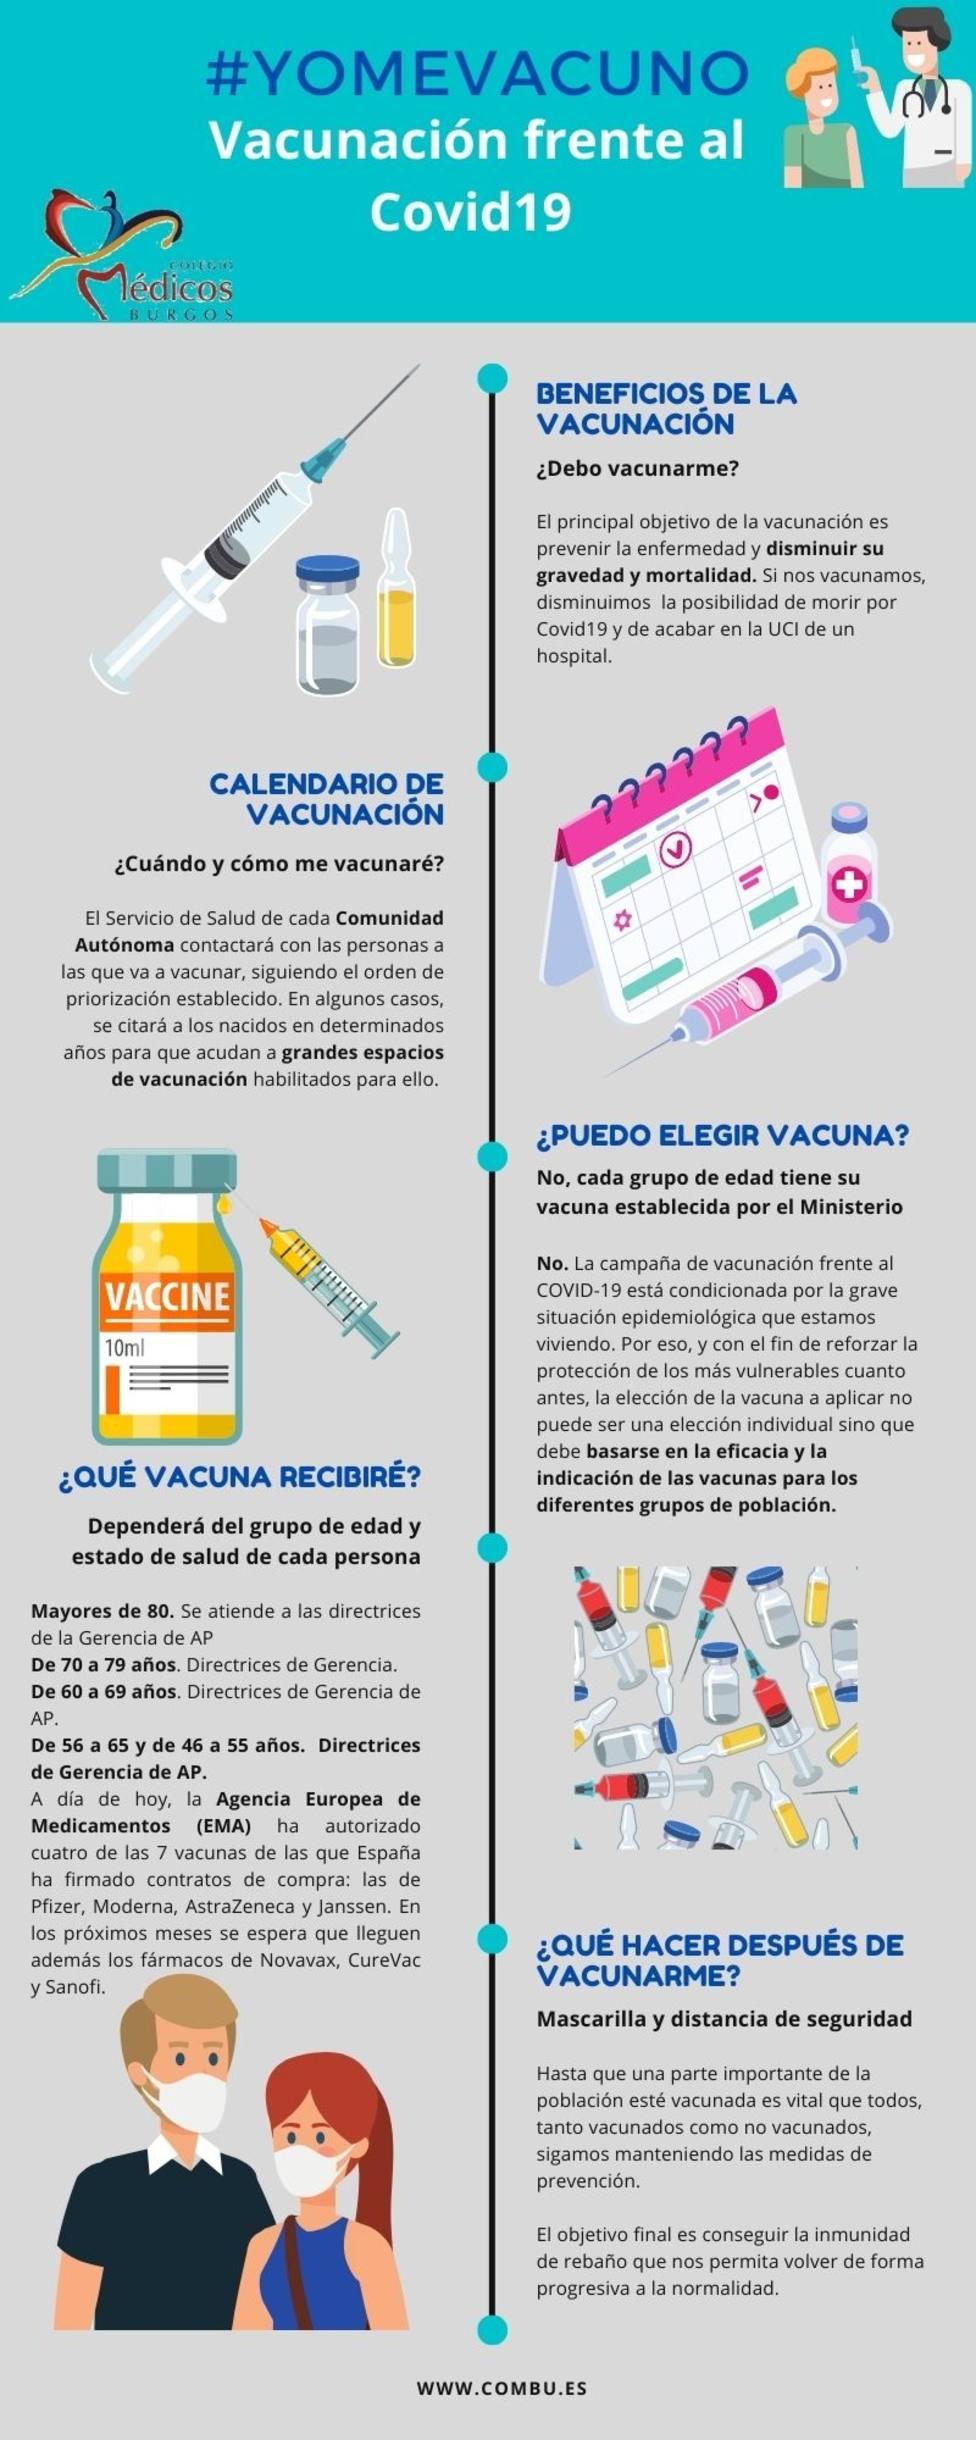 ctv-tez-combu-vacunacion-frente-al-covid19-combu-20219